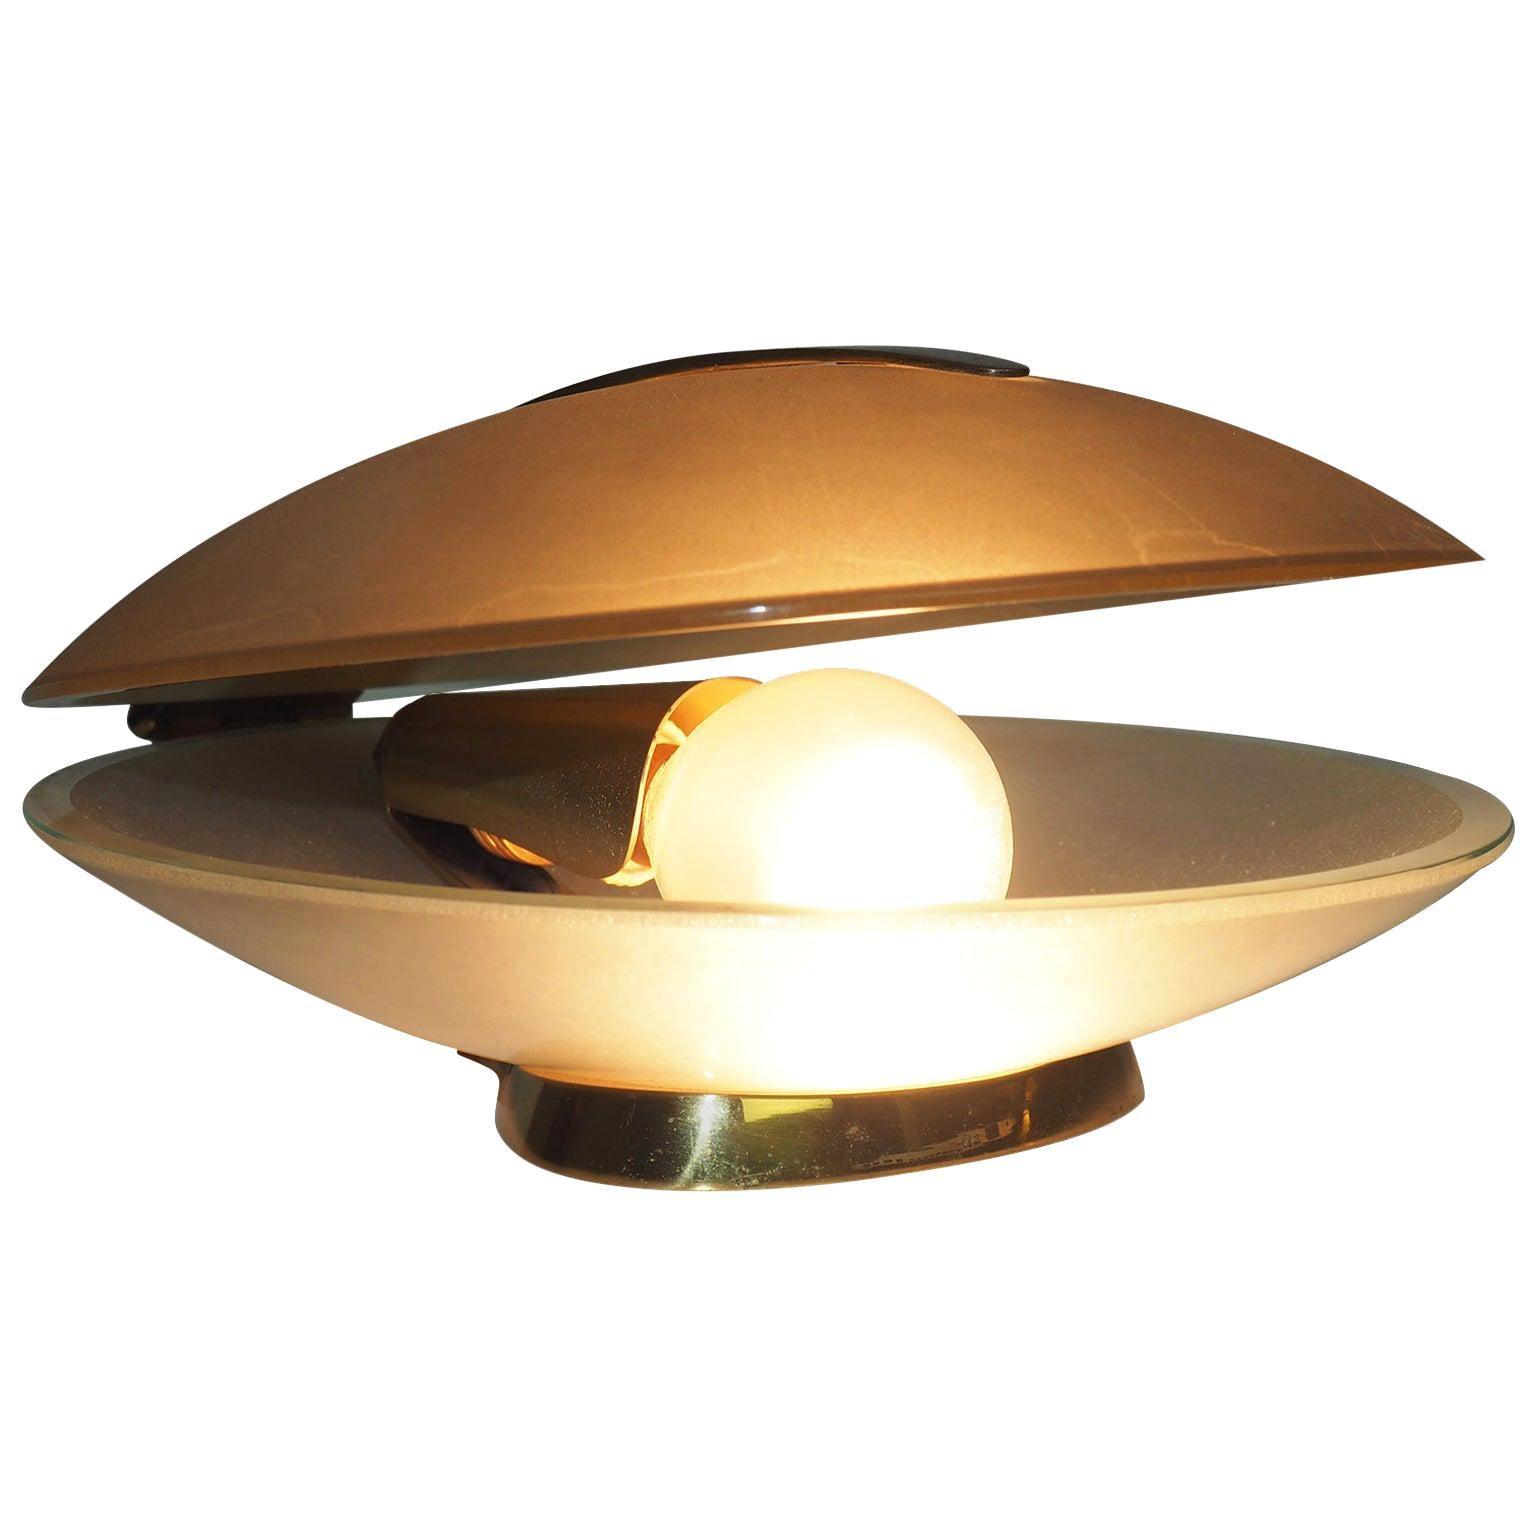 Max Ingrand's Table Lamp Sublime Design for Fontana Arte, Milano, 1960